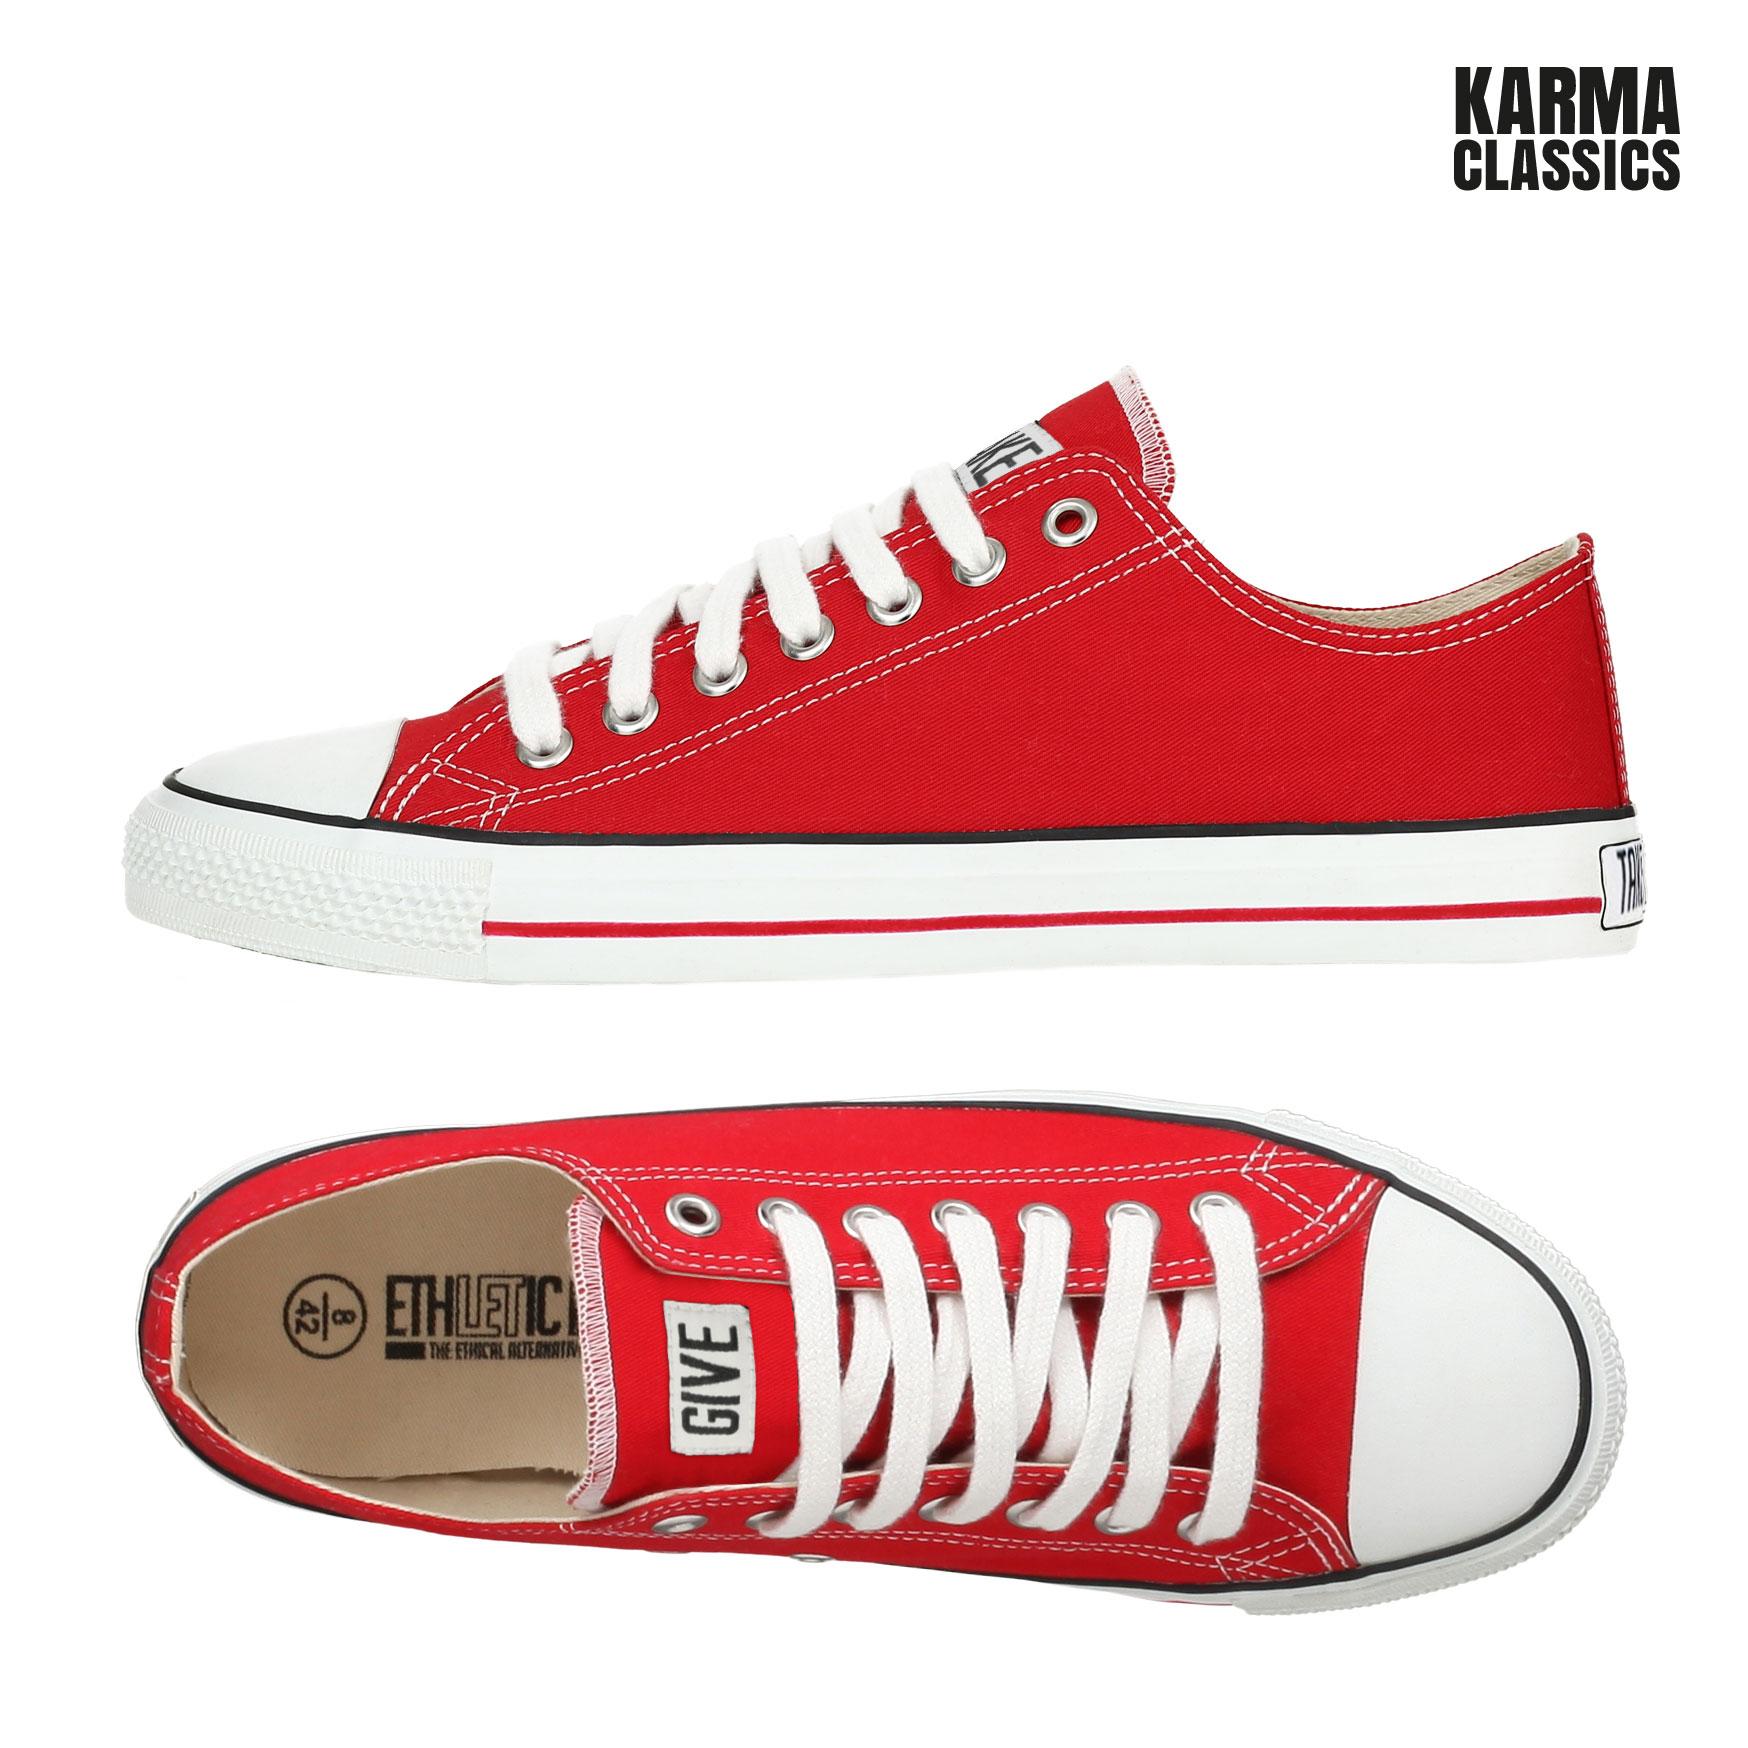 summer-edition_karma-deal